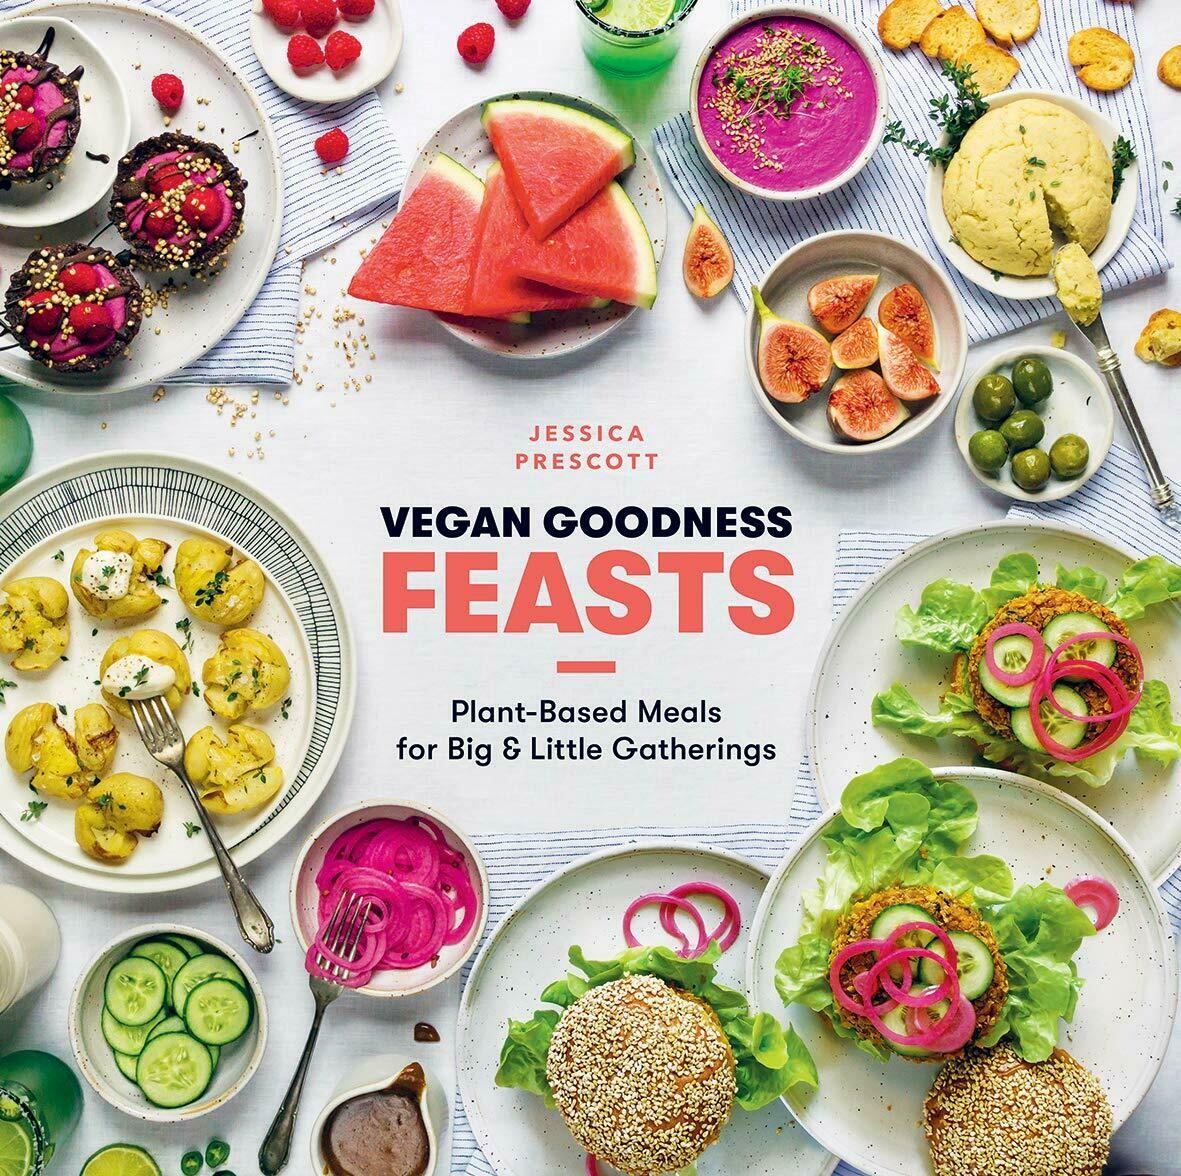 Vegan Goodness: Feasts